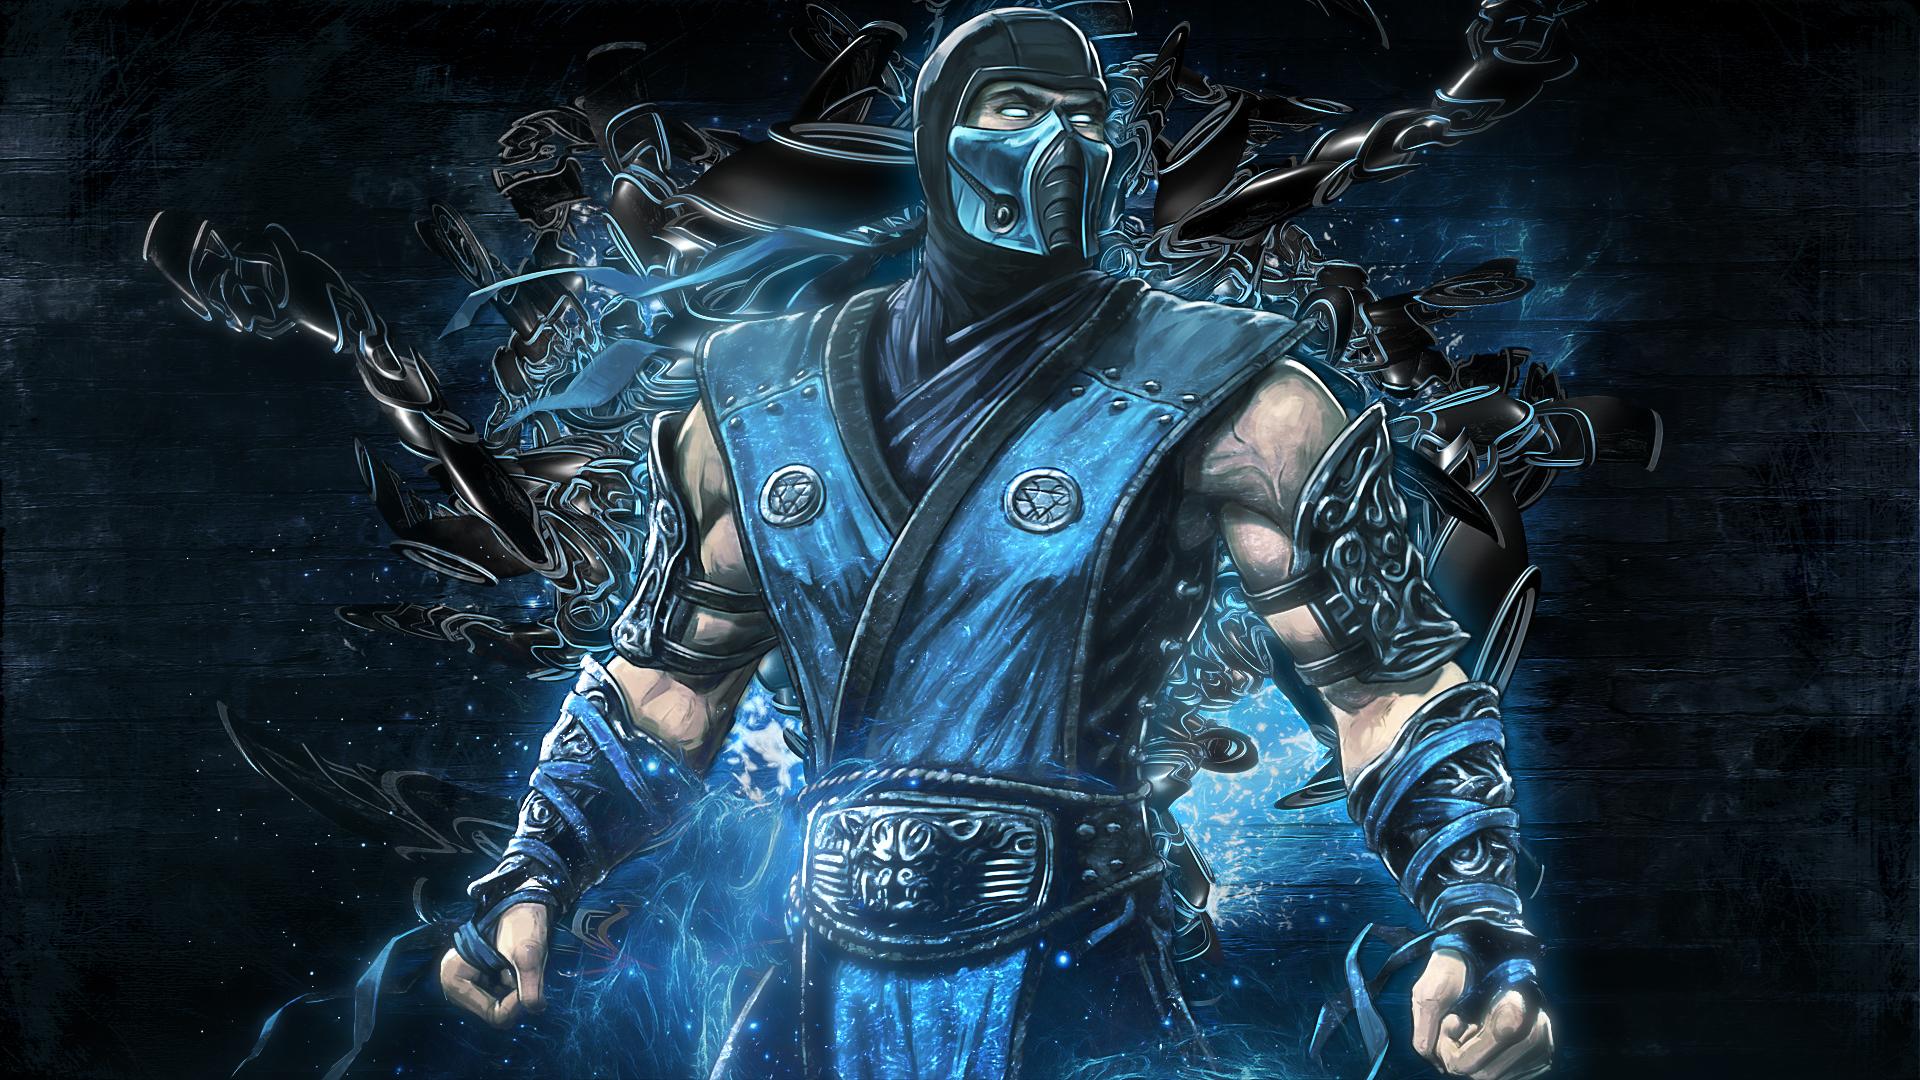 Sub Zero Mortal Kombat Wallpaper 1920x1080 83546